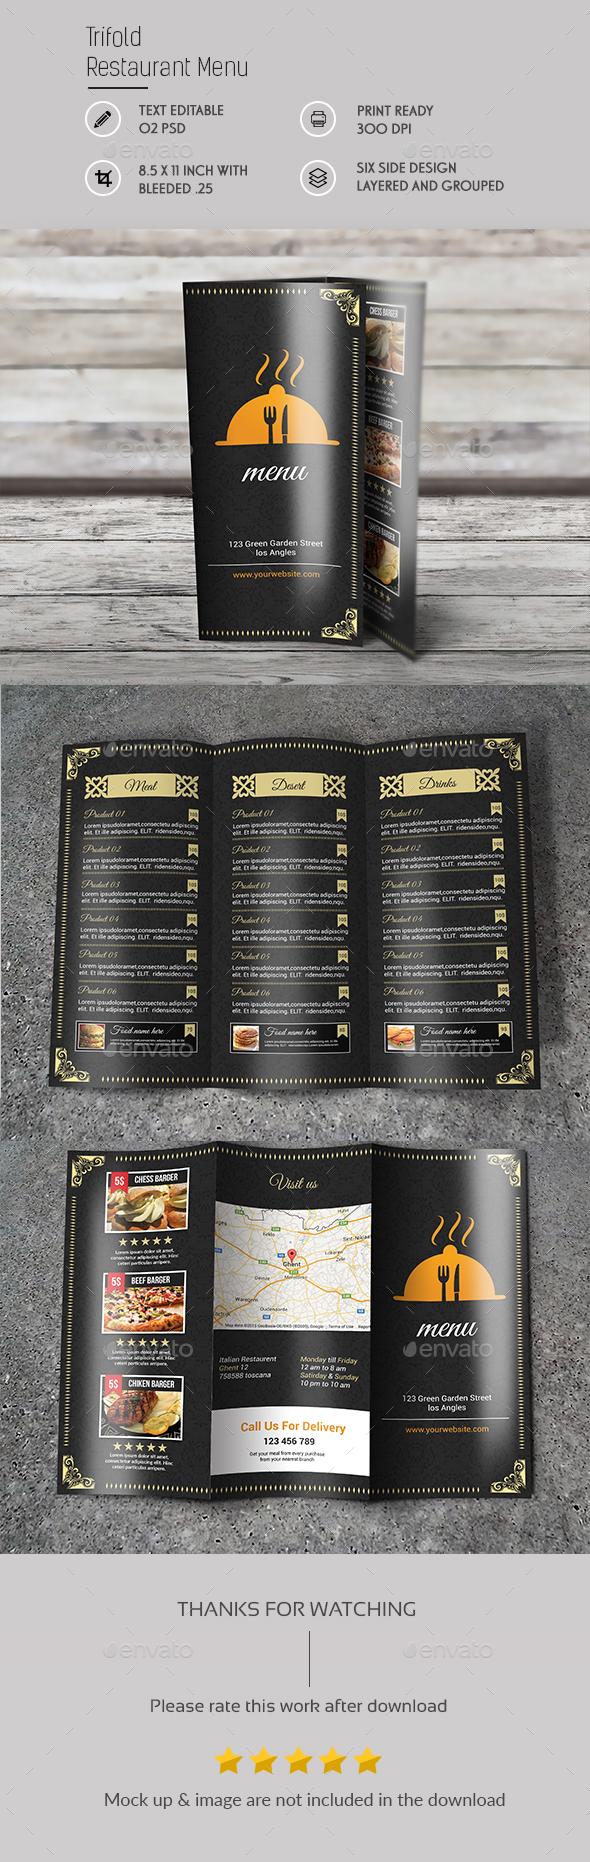 Tri Fold Restaurant BrochureTemplate - Brochures Print Templates